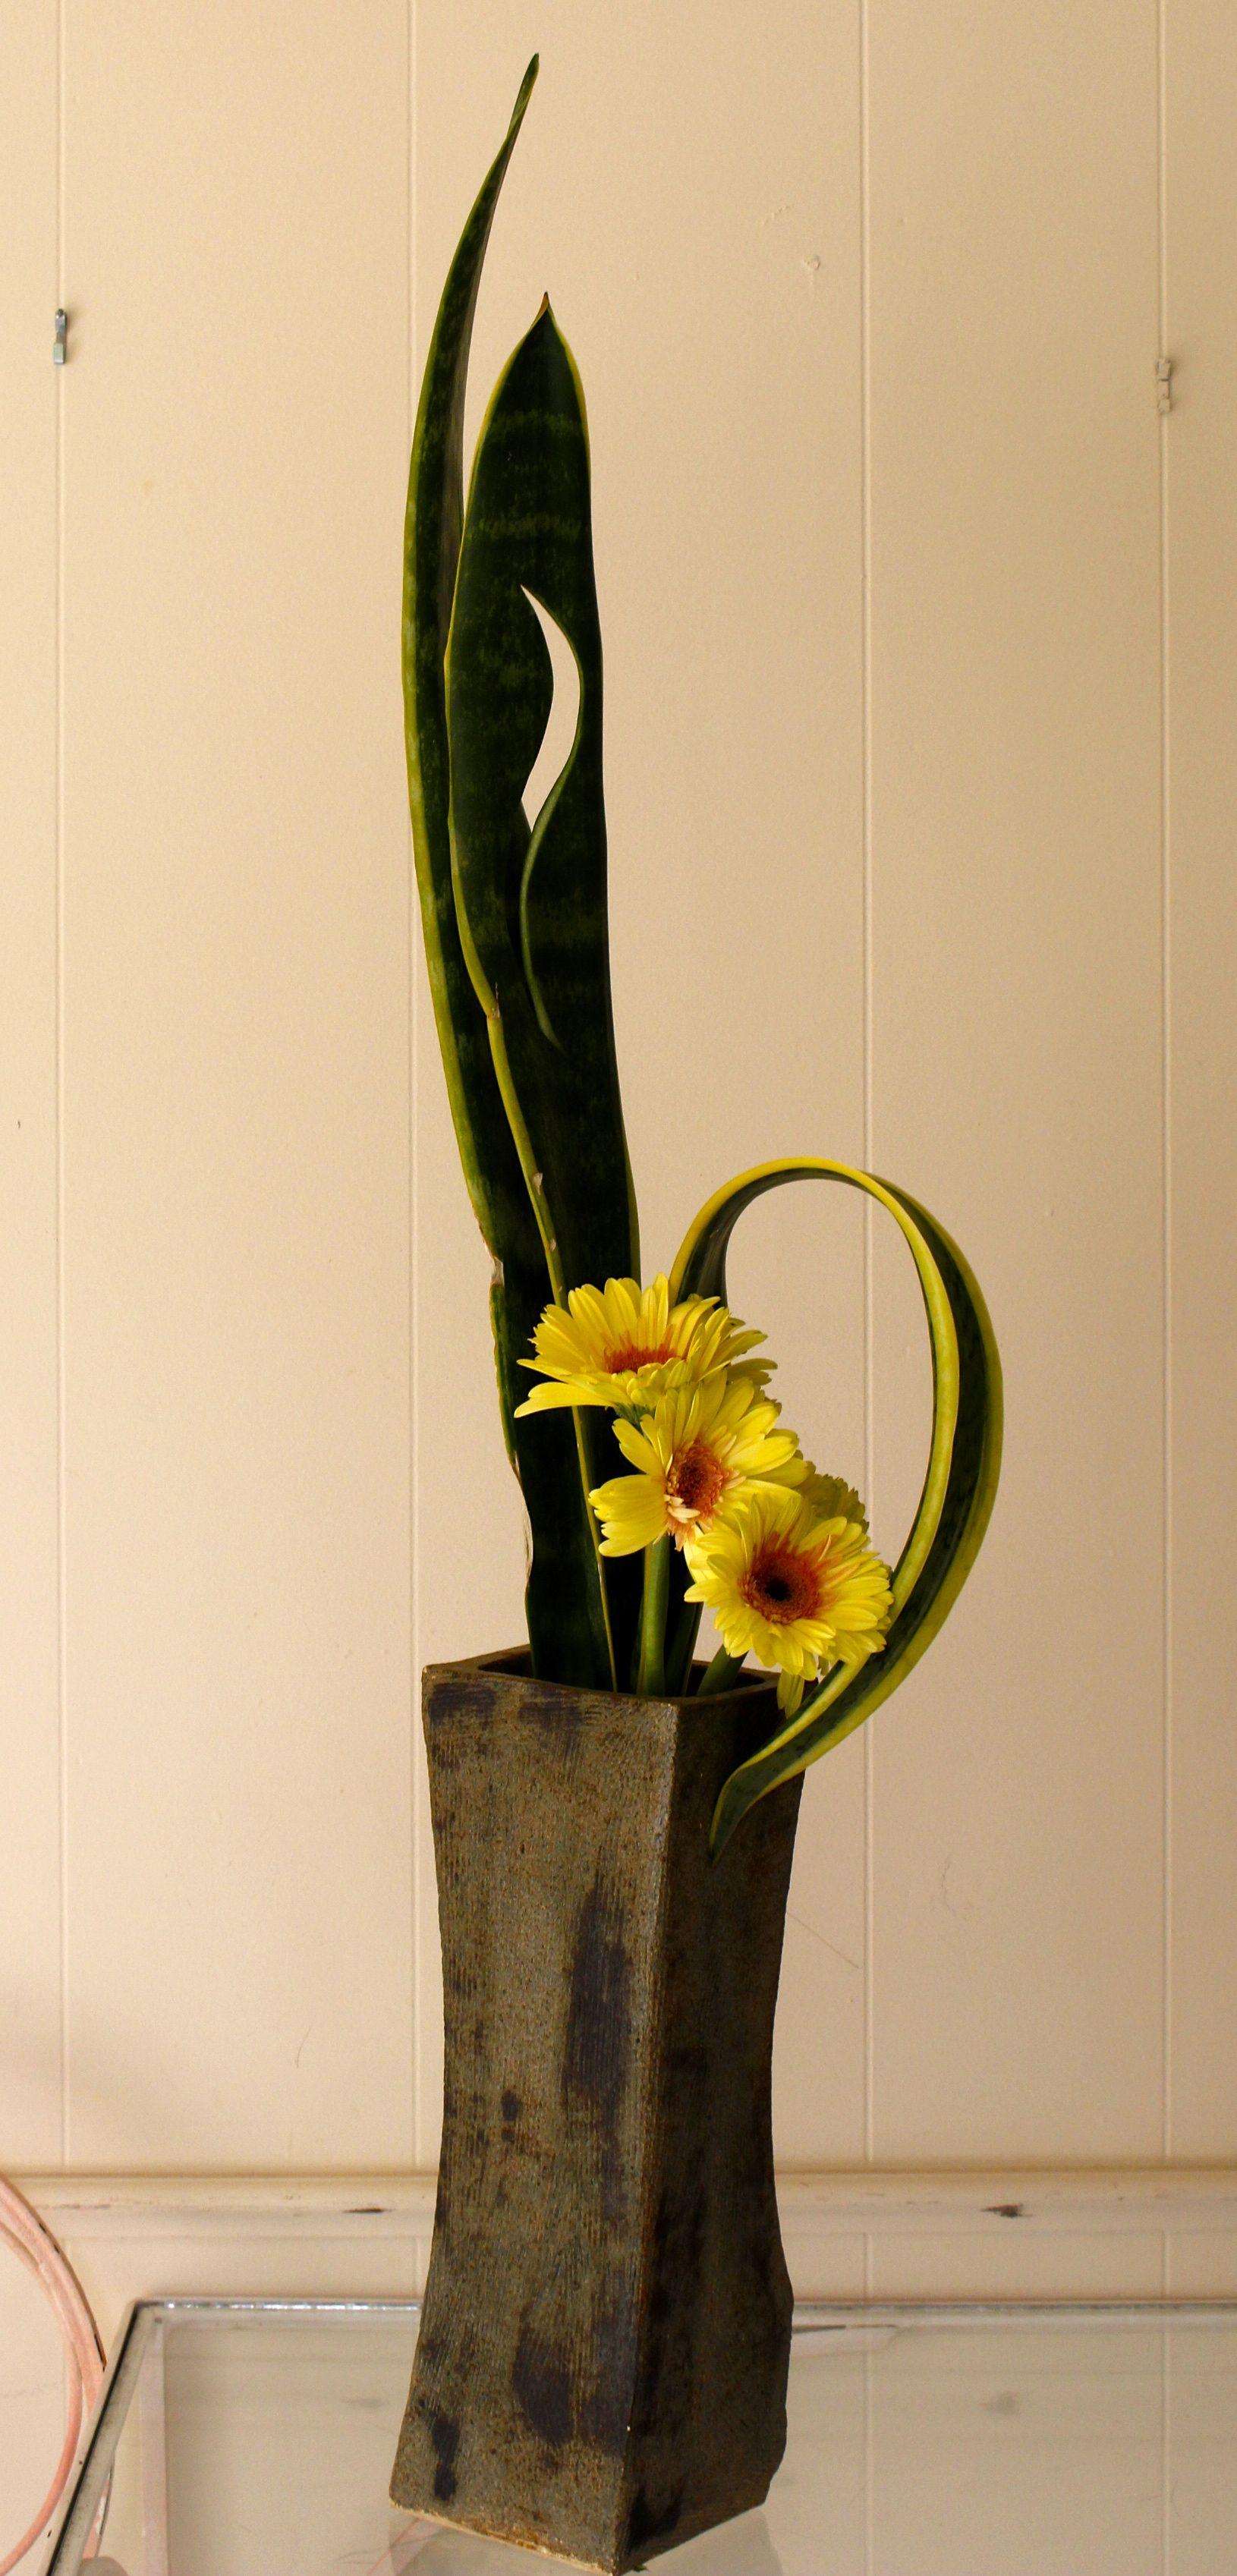 Penny Decker Instructor Ffgc Floral Design Unit 9 Daytona Beach Fl Ikebana Flower Arrangement Creative Flower Arrangements Contemporary Flower Arrangements